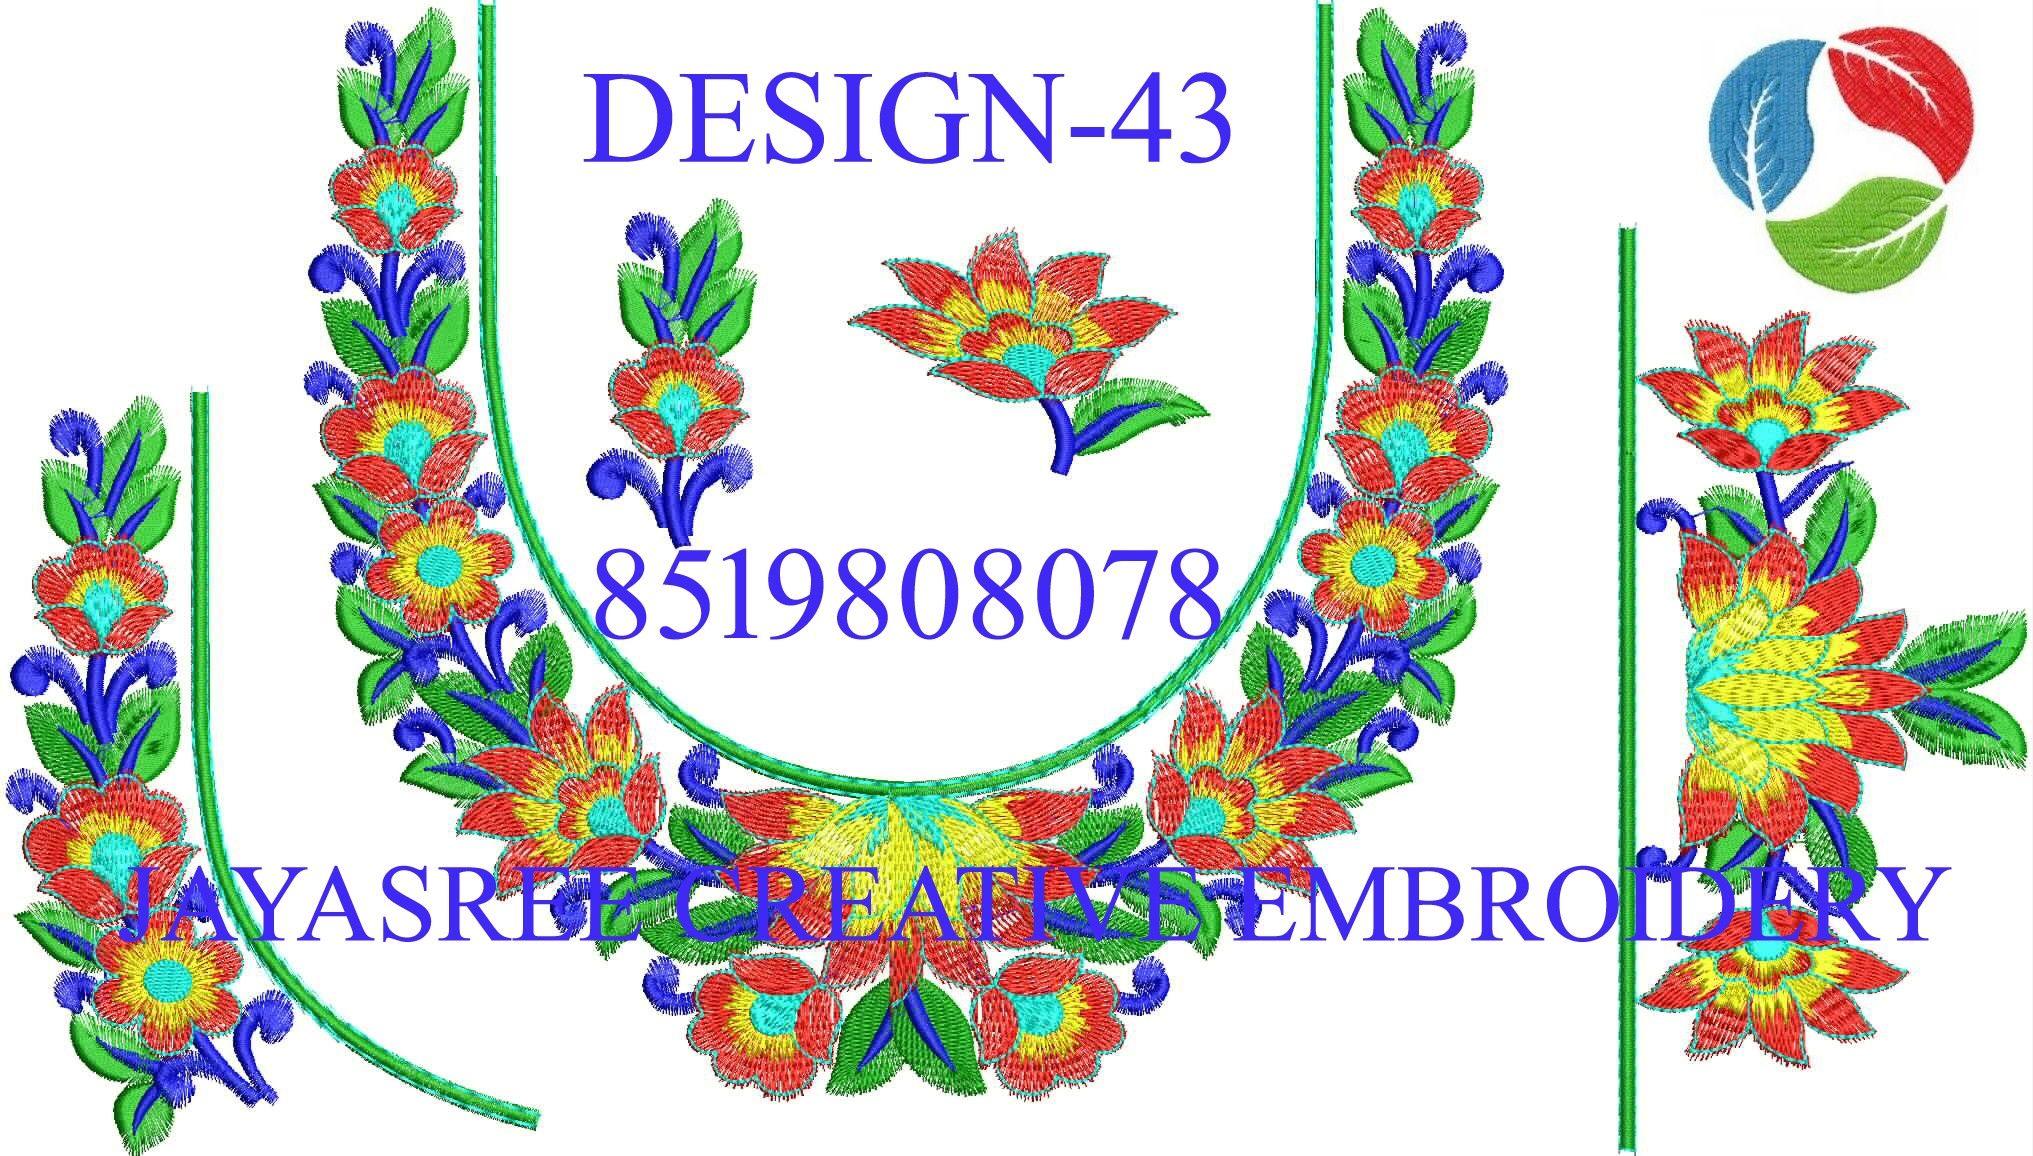 Pin By Jayasree On Jayasree Creative Embroidery Designs Temple Grandin Movie Autism Society South Carolina Gift